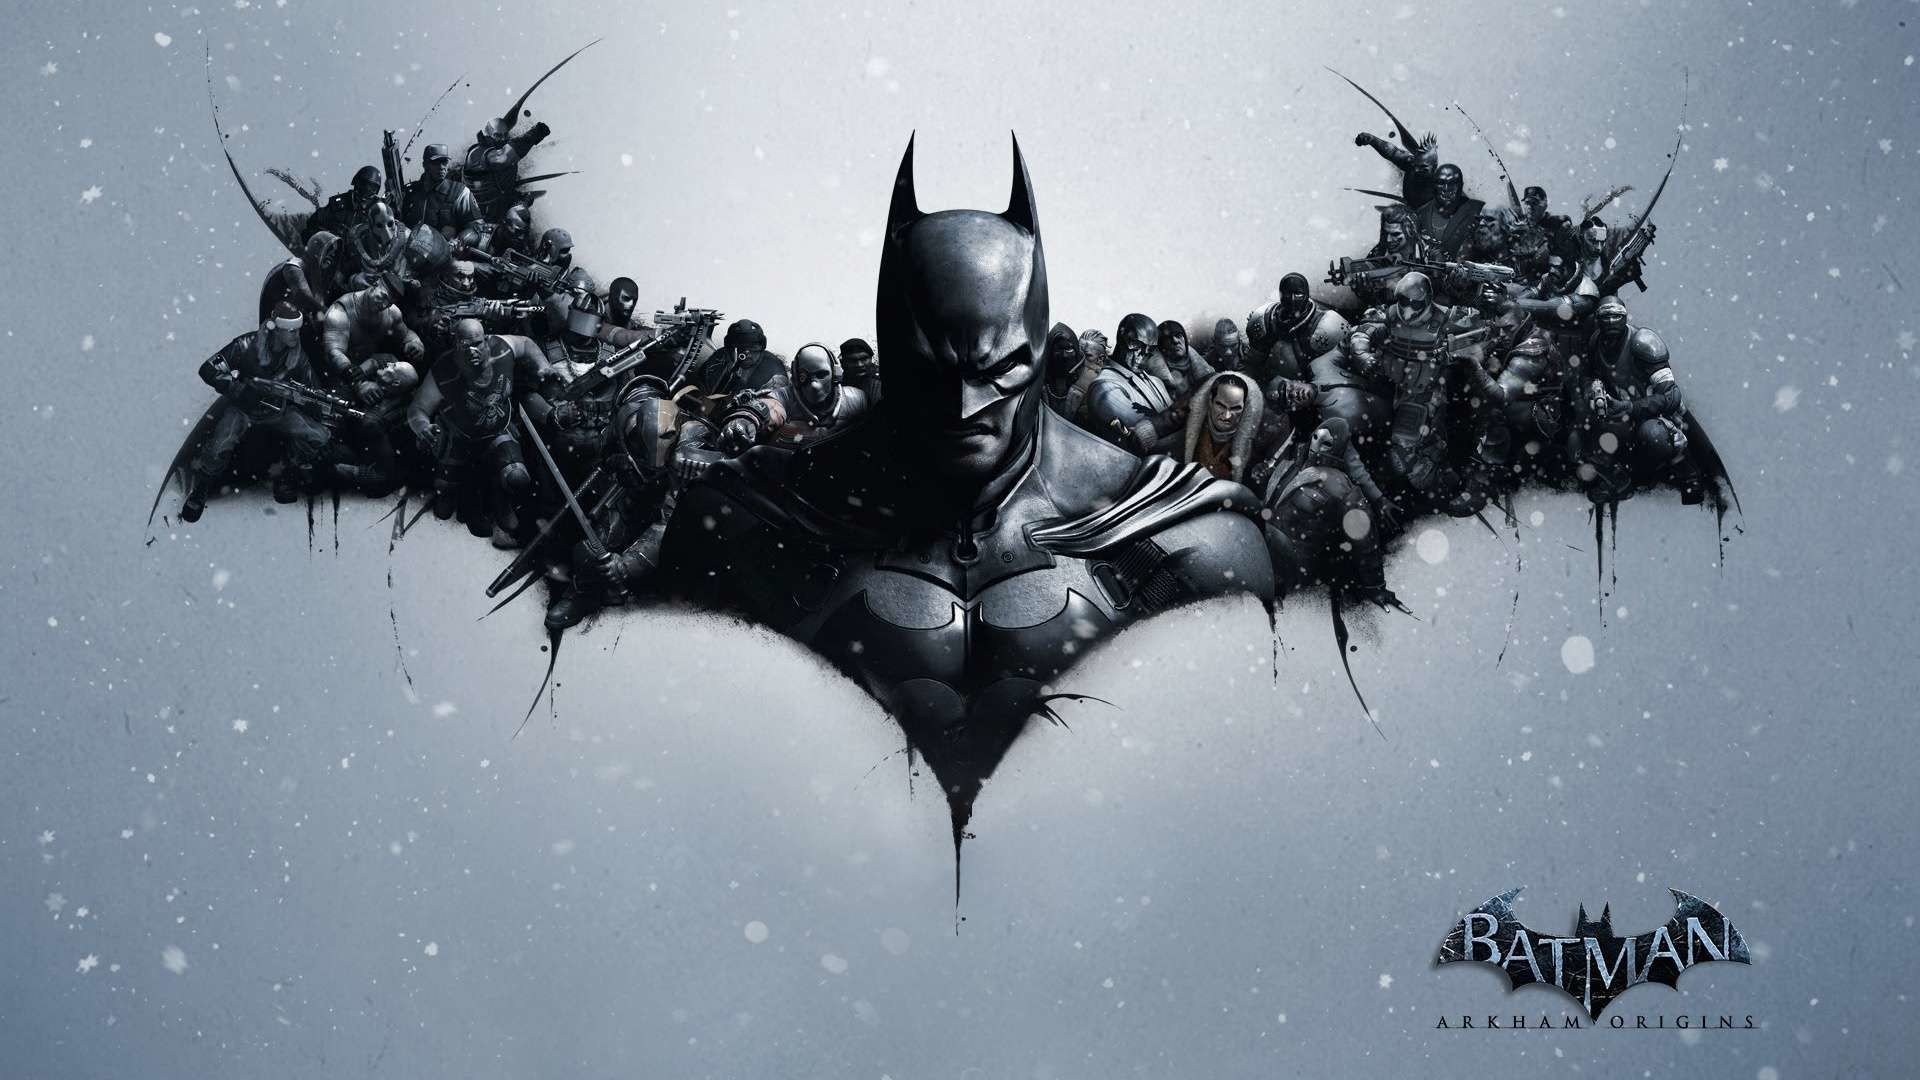 Batman HD Wallpapers 1080p 76 Images